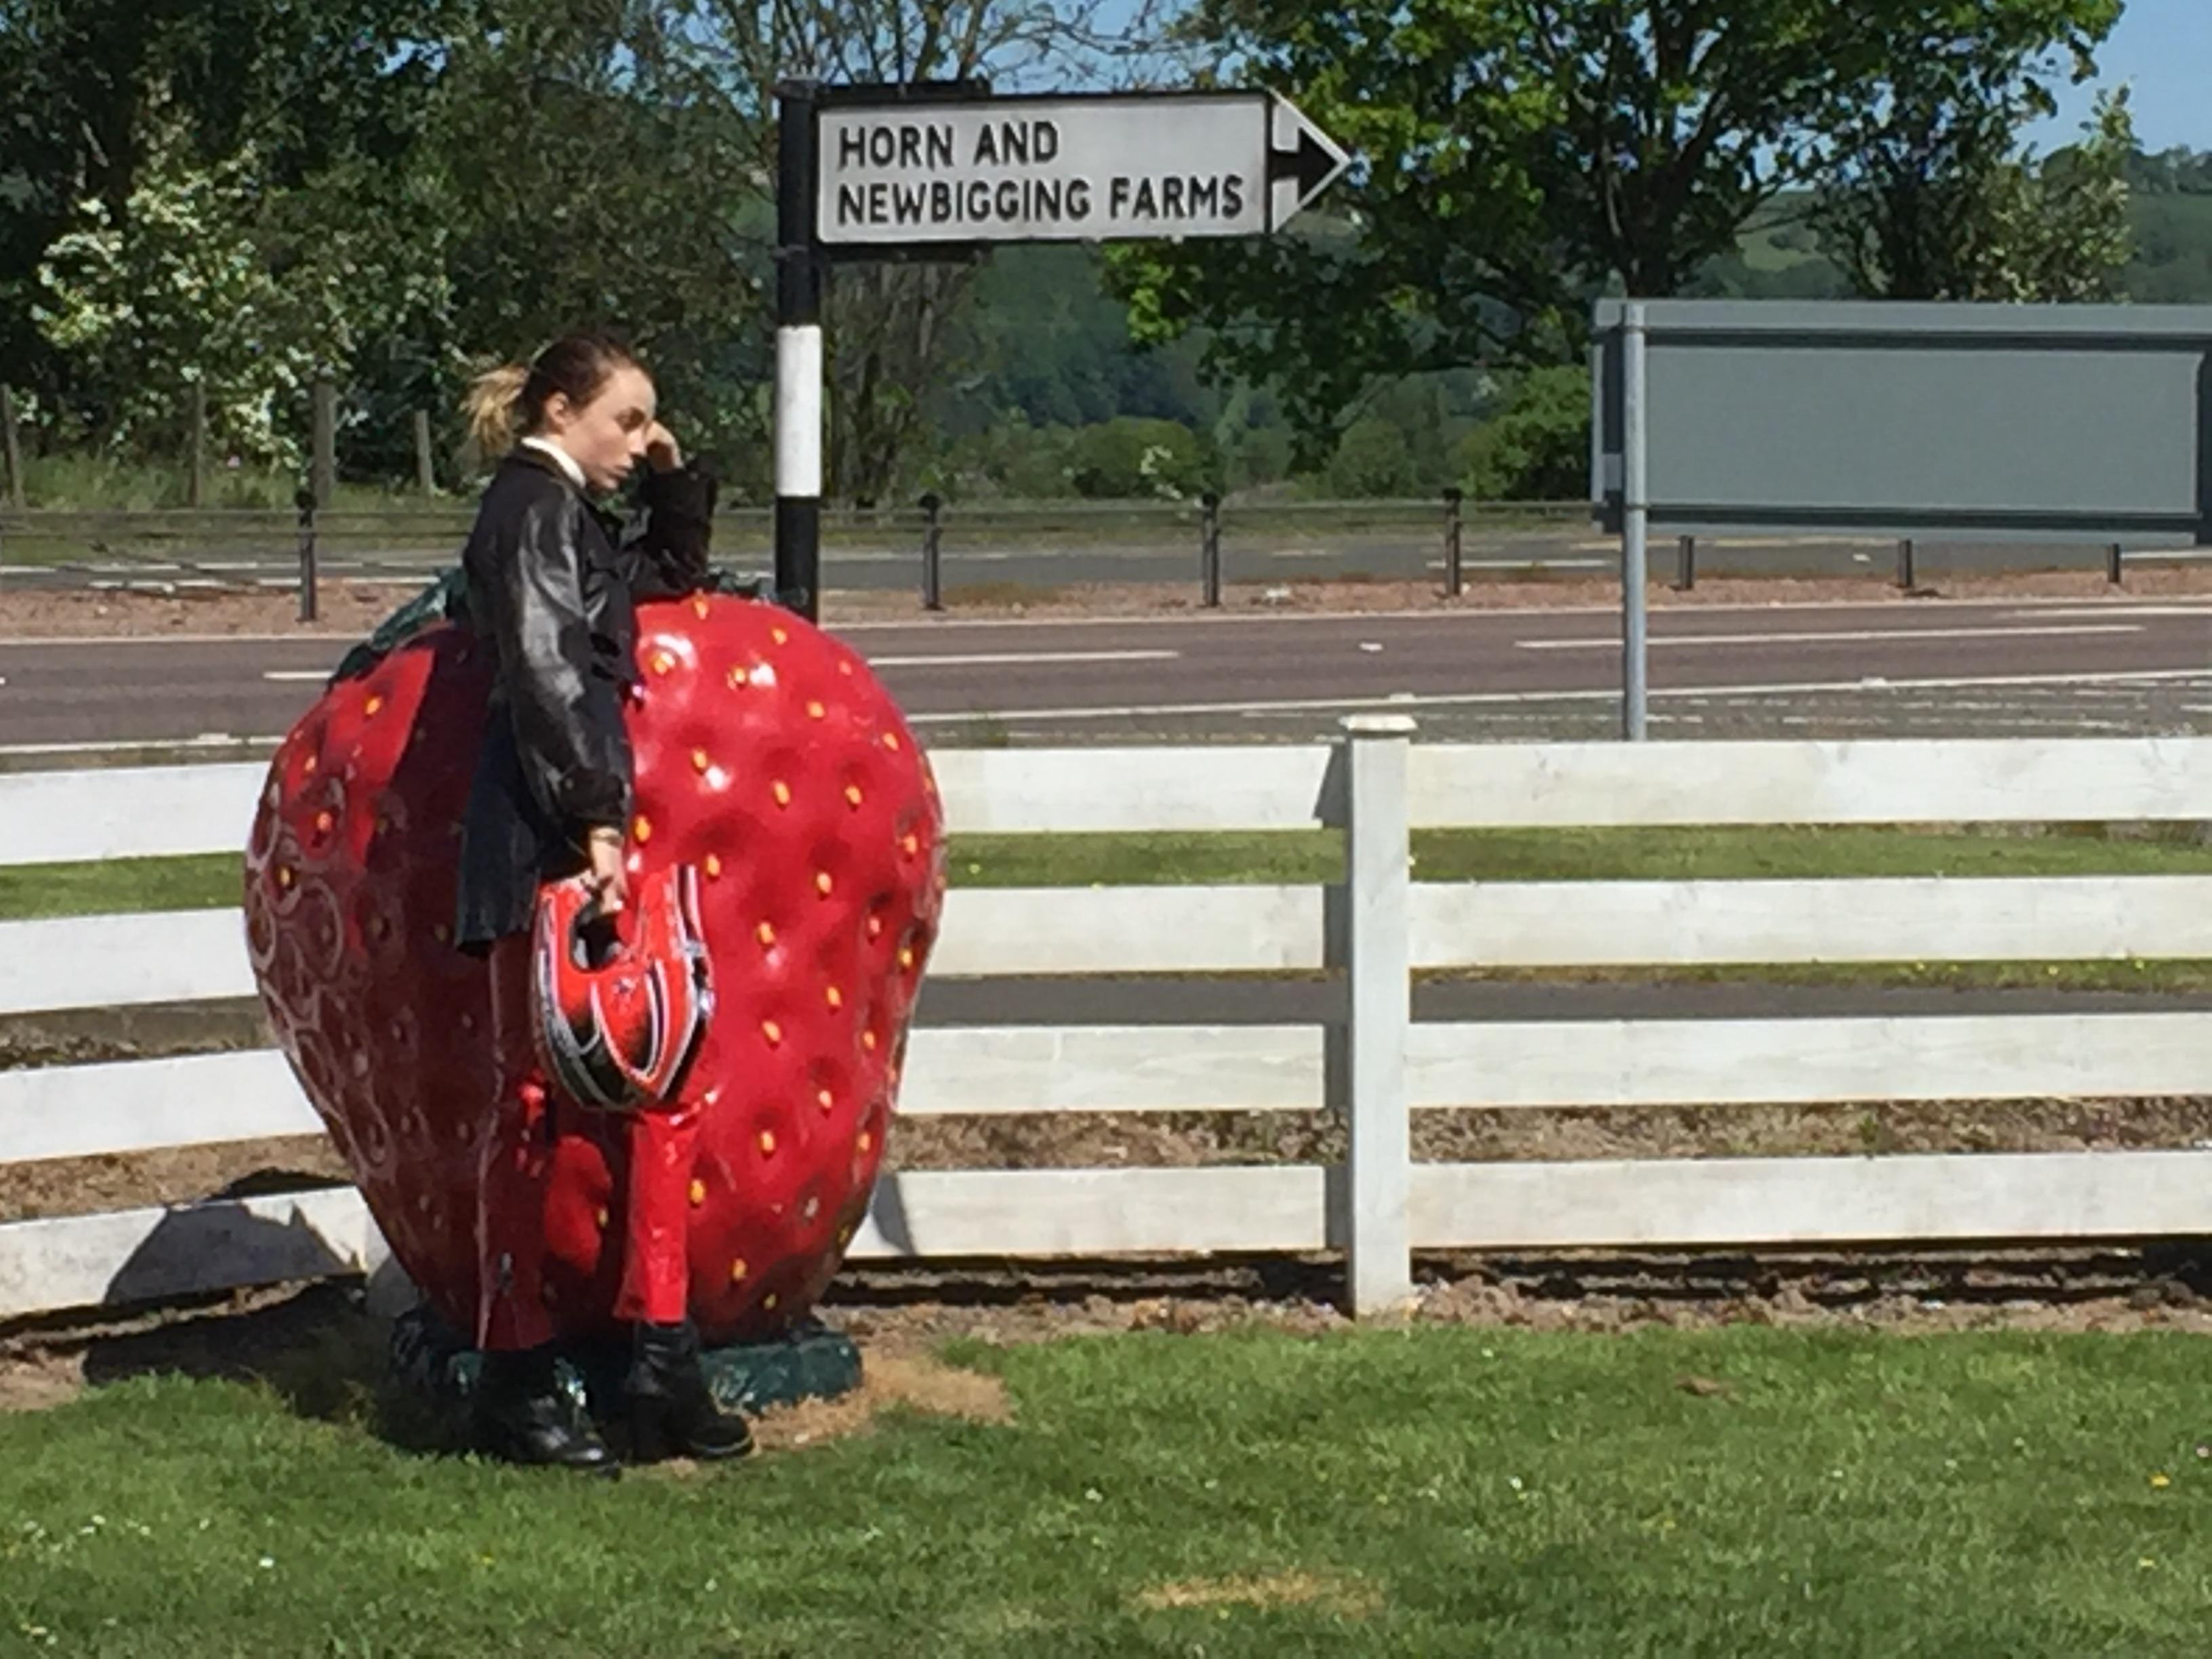 Vogue Photoshoot Giant Strawberry Model